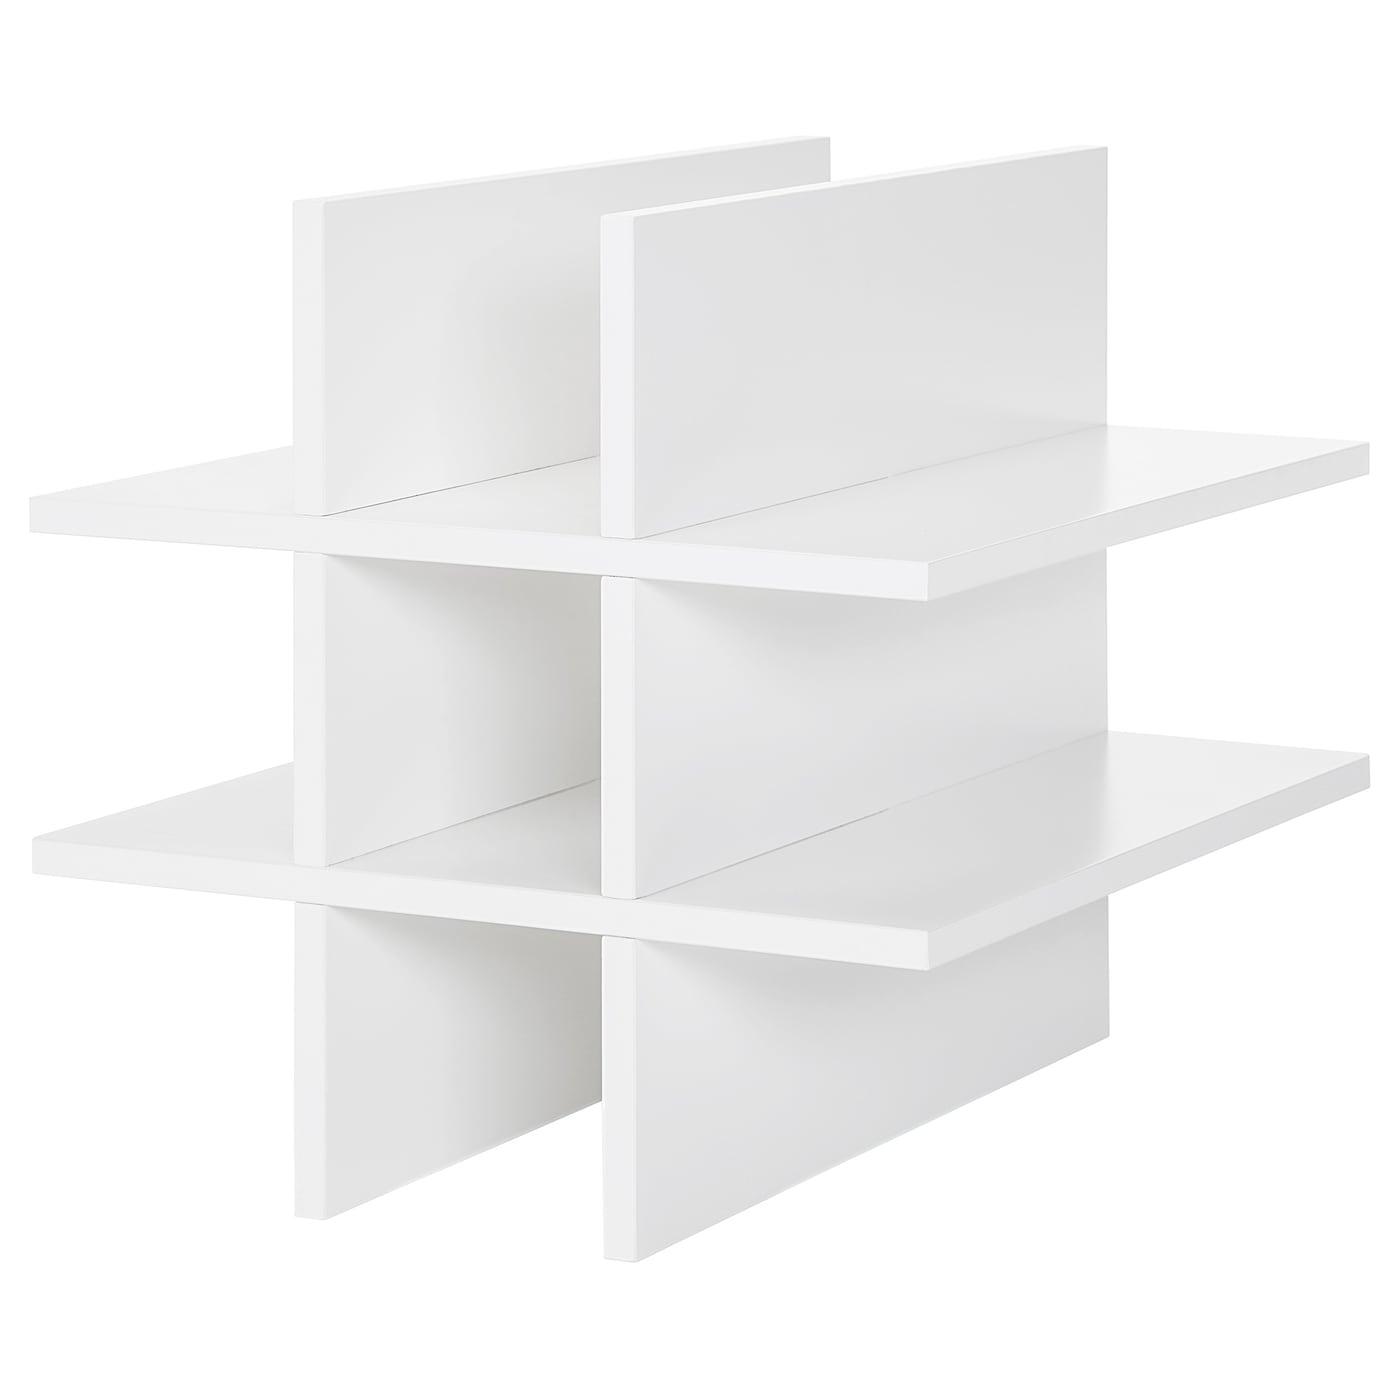 Weinregal Keller Ikea Caseconrad Com